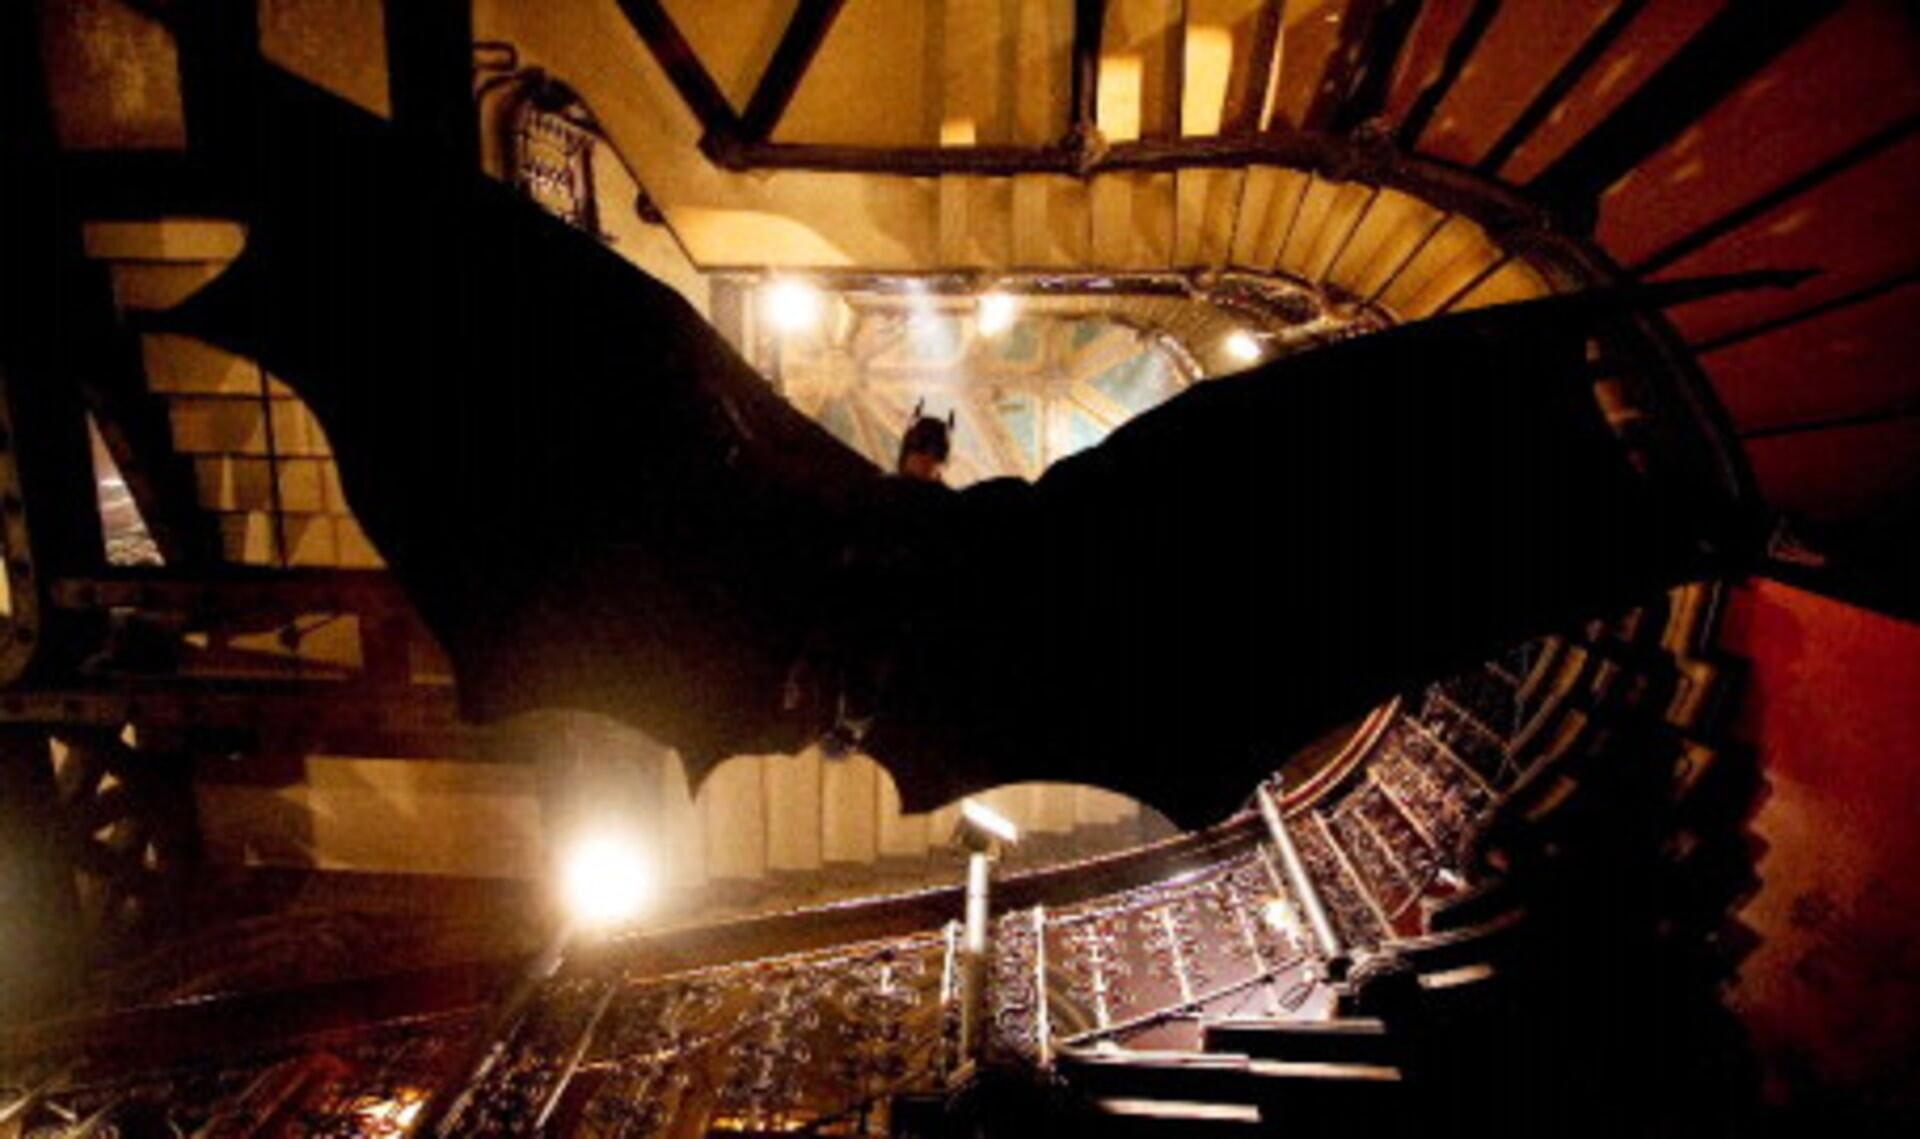 Batman Begins - Image 10